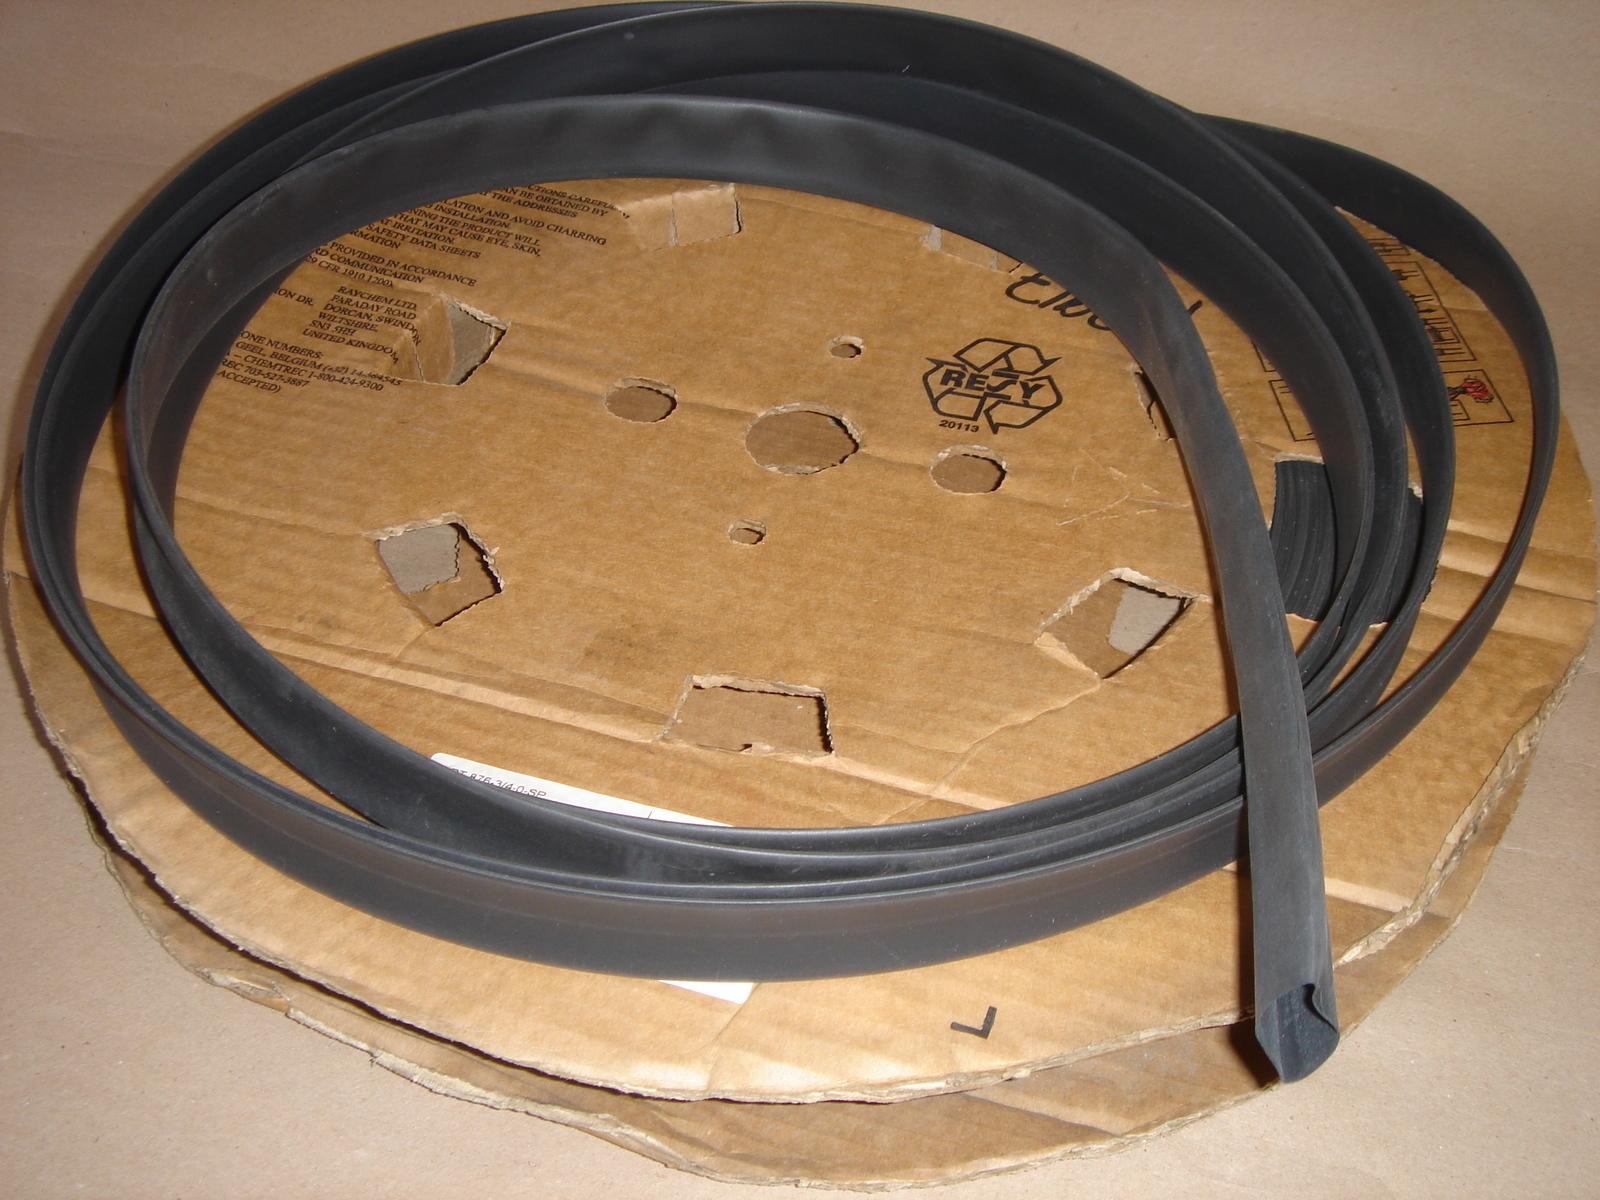 Termokahanev toru 4,8/2,4 mm, must, Plastronic